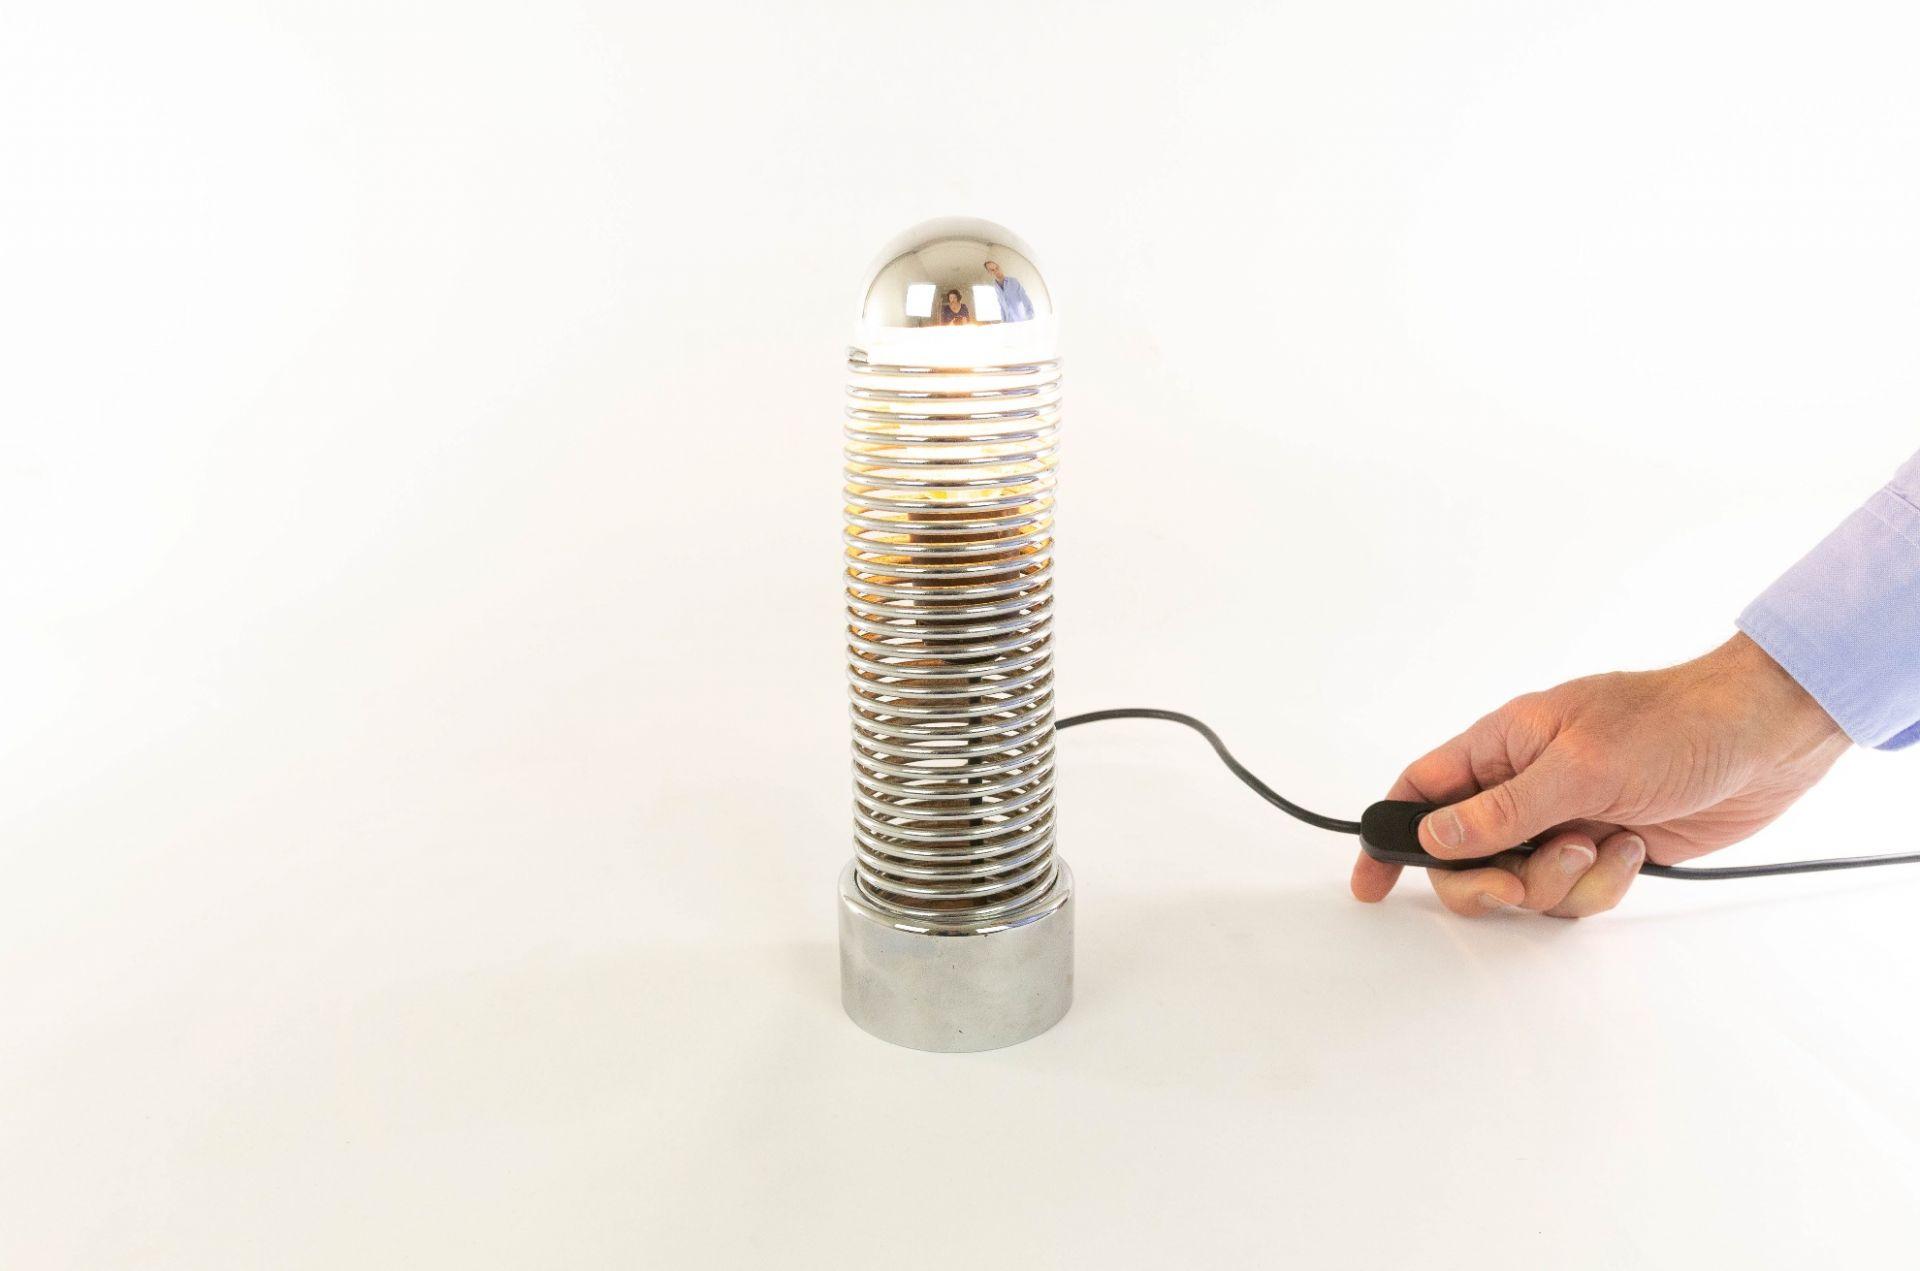 Jo-Jo Chrome table lamp by Heinz Brenker for Harvey Guzzini, 1971